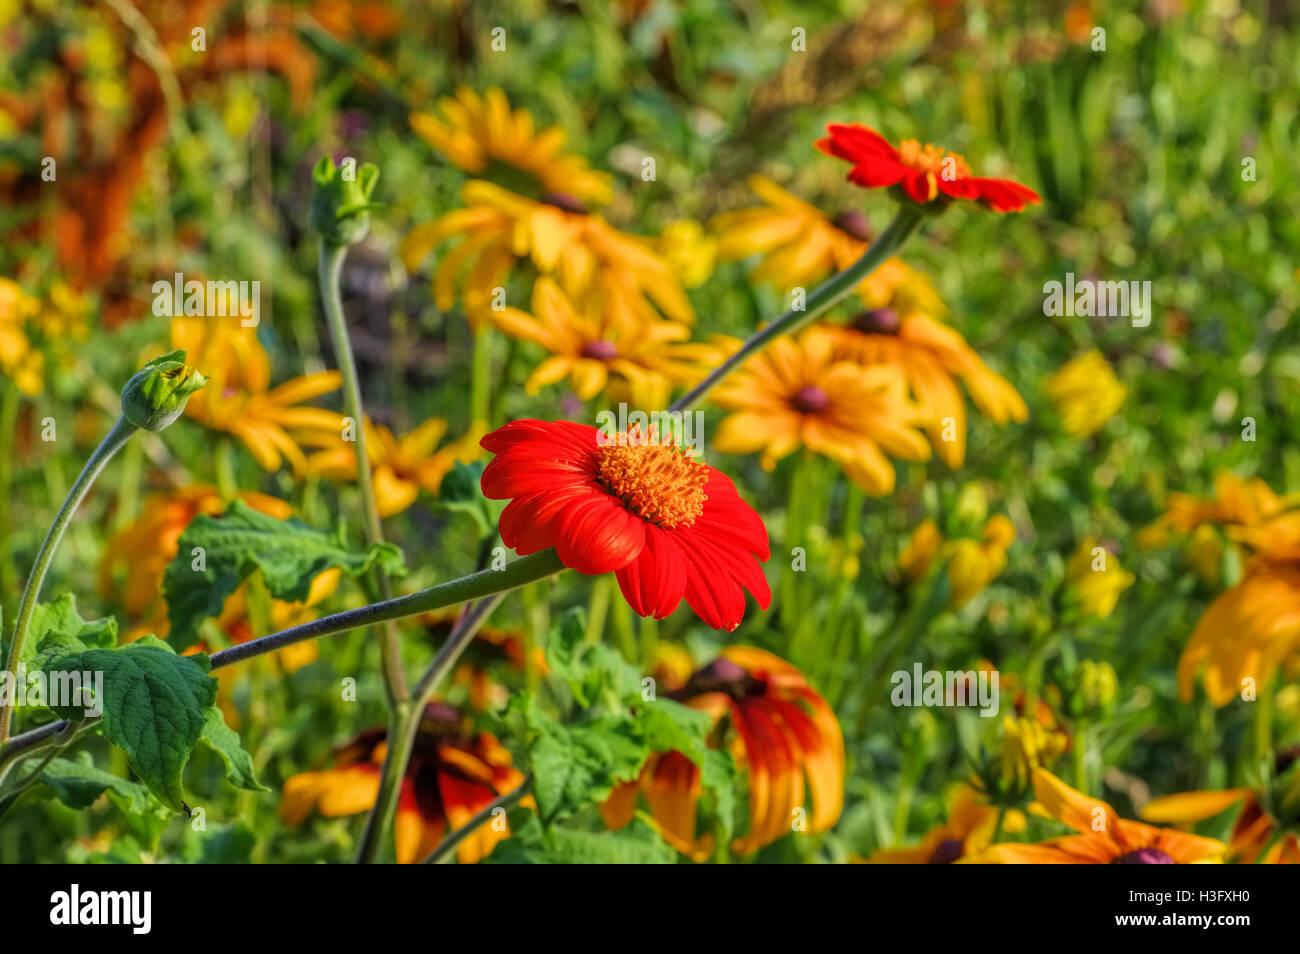 Mexikanische Sonnenblume oder Tithonia rotundifolia -  Mexican sunflower or Tithonia rotundifolia in summer - Stock Image